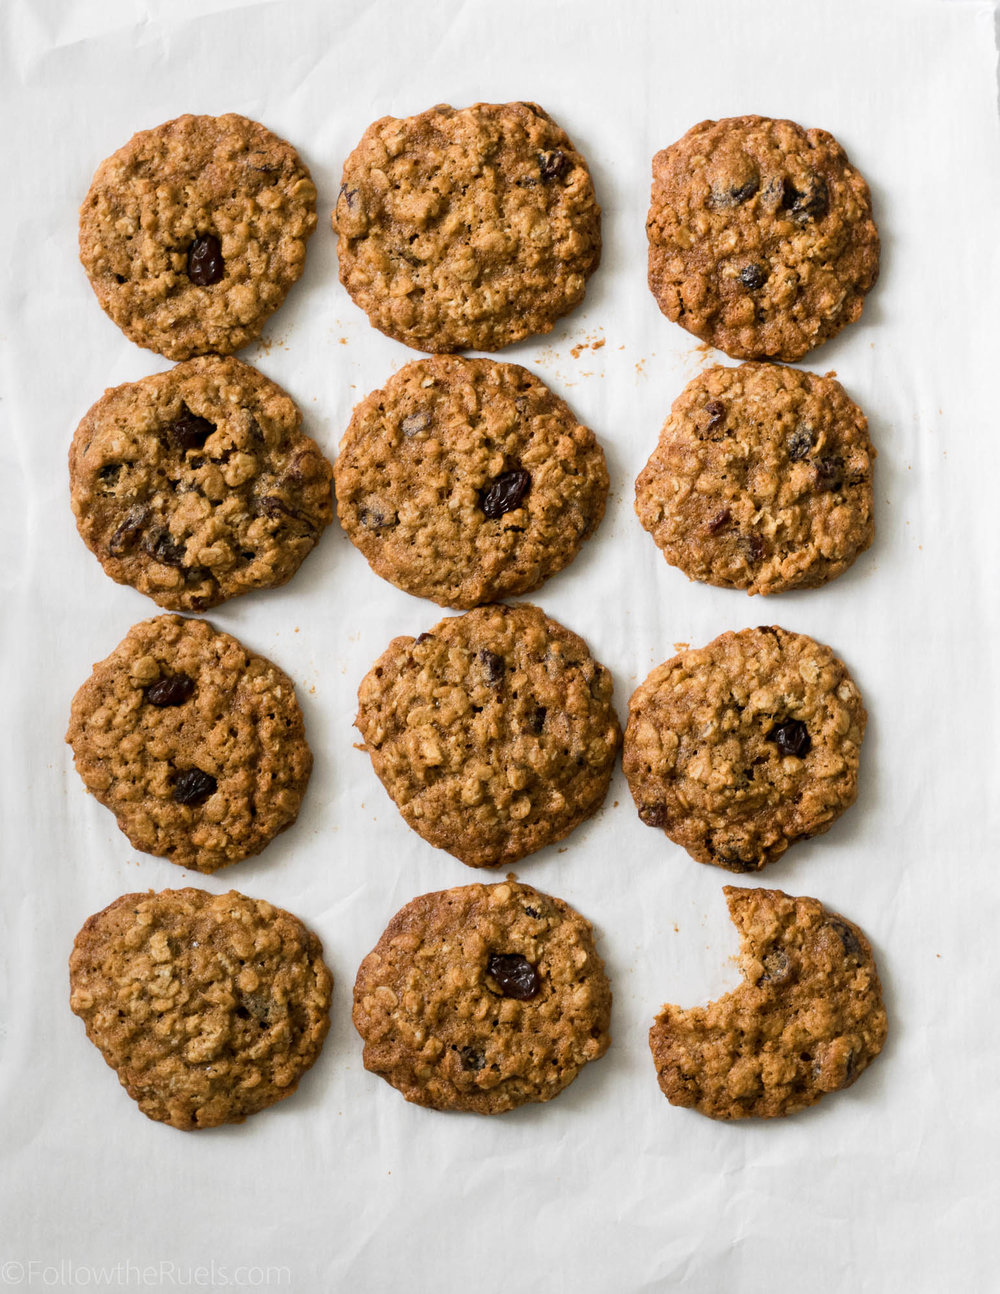 Oatmeal-Raisin-Cookies-7.jpg